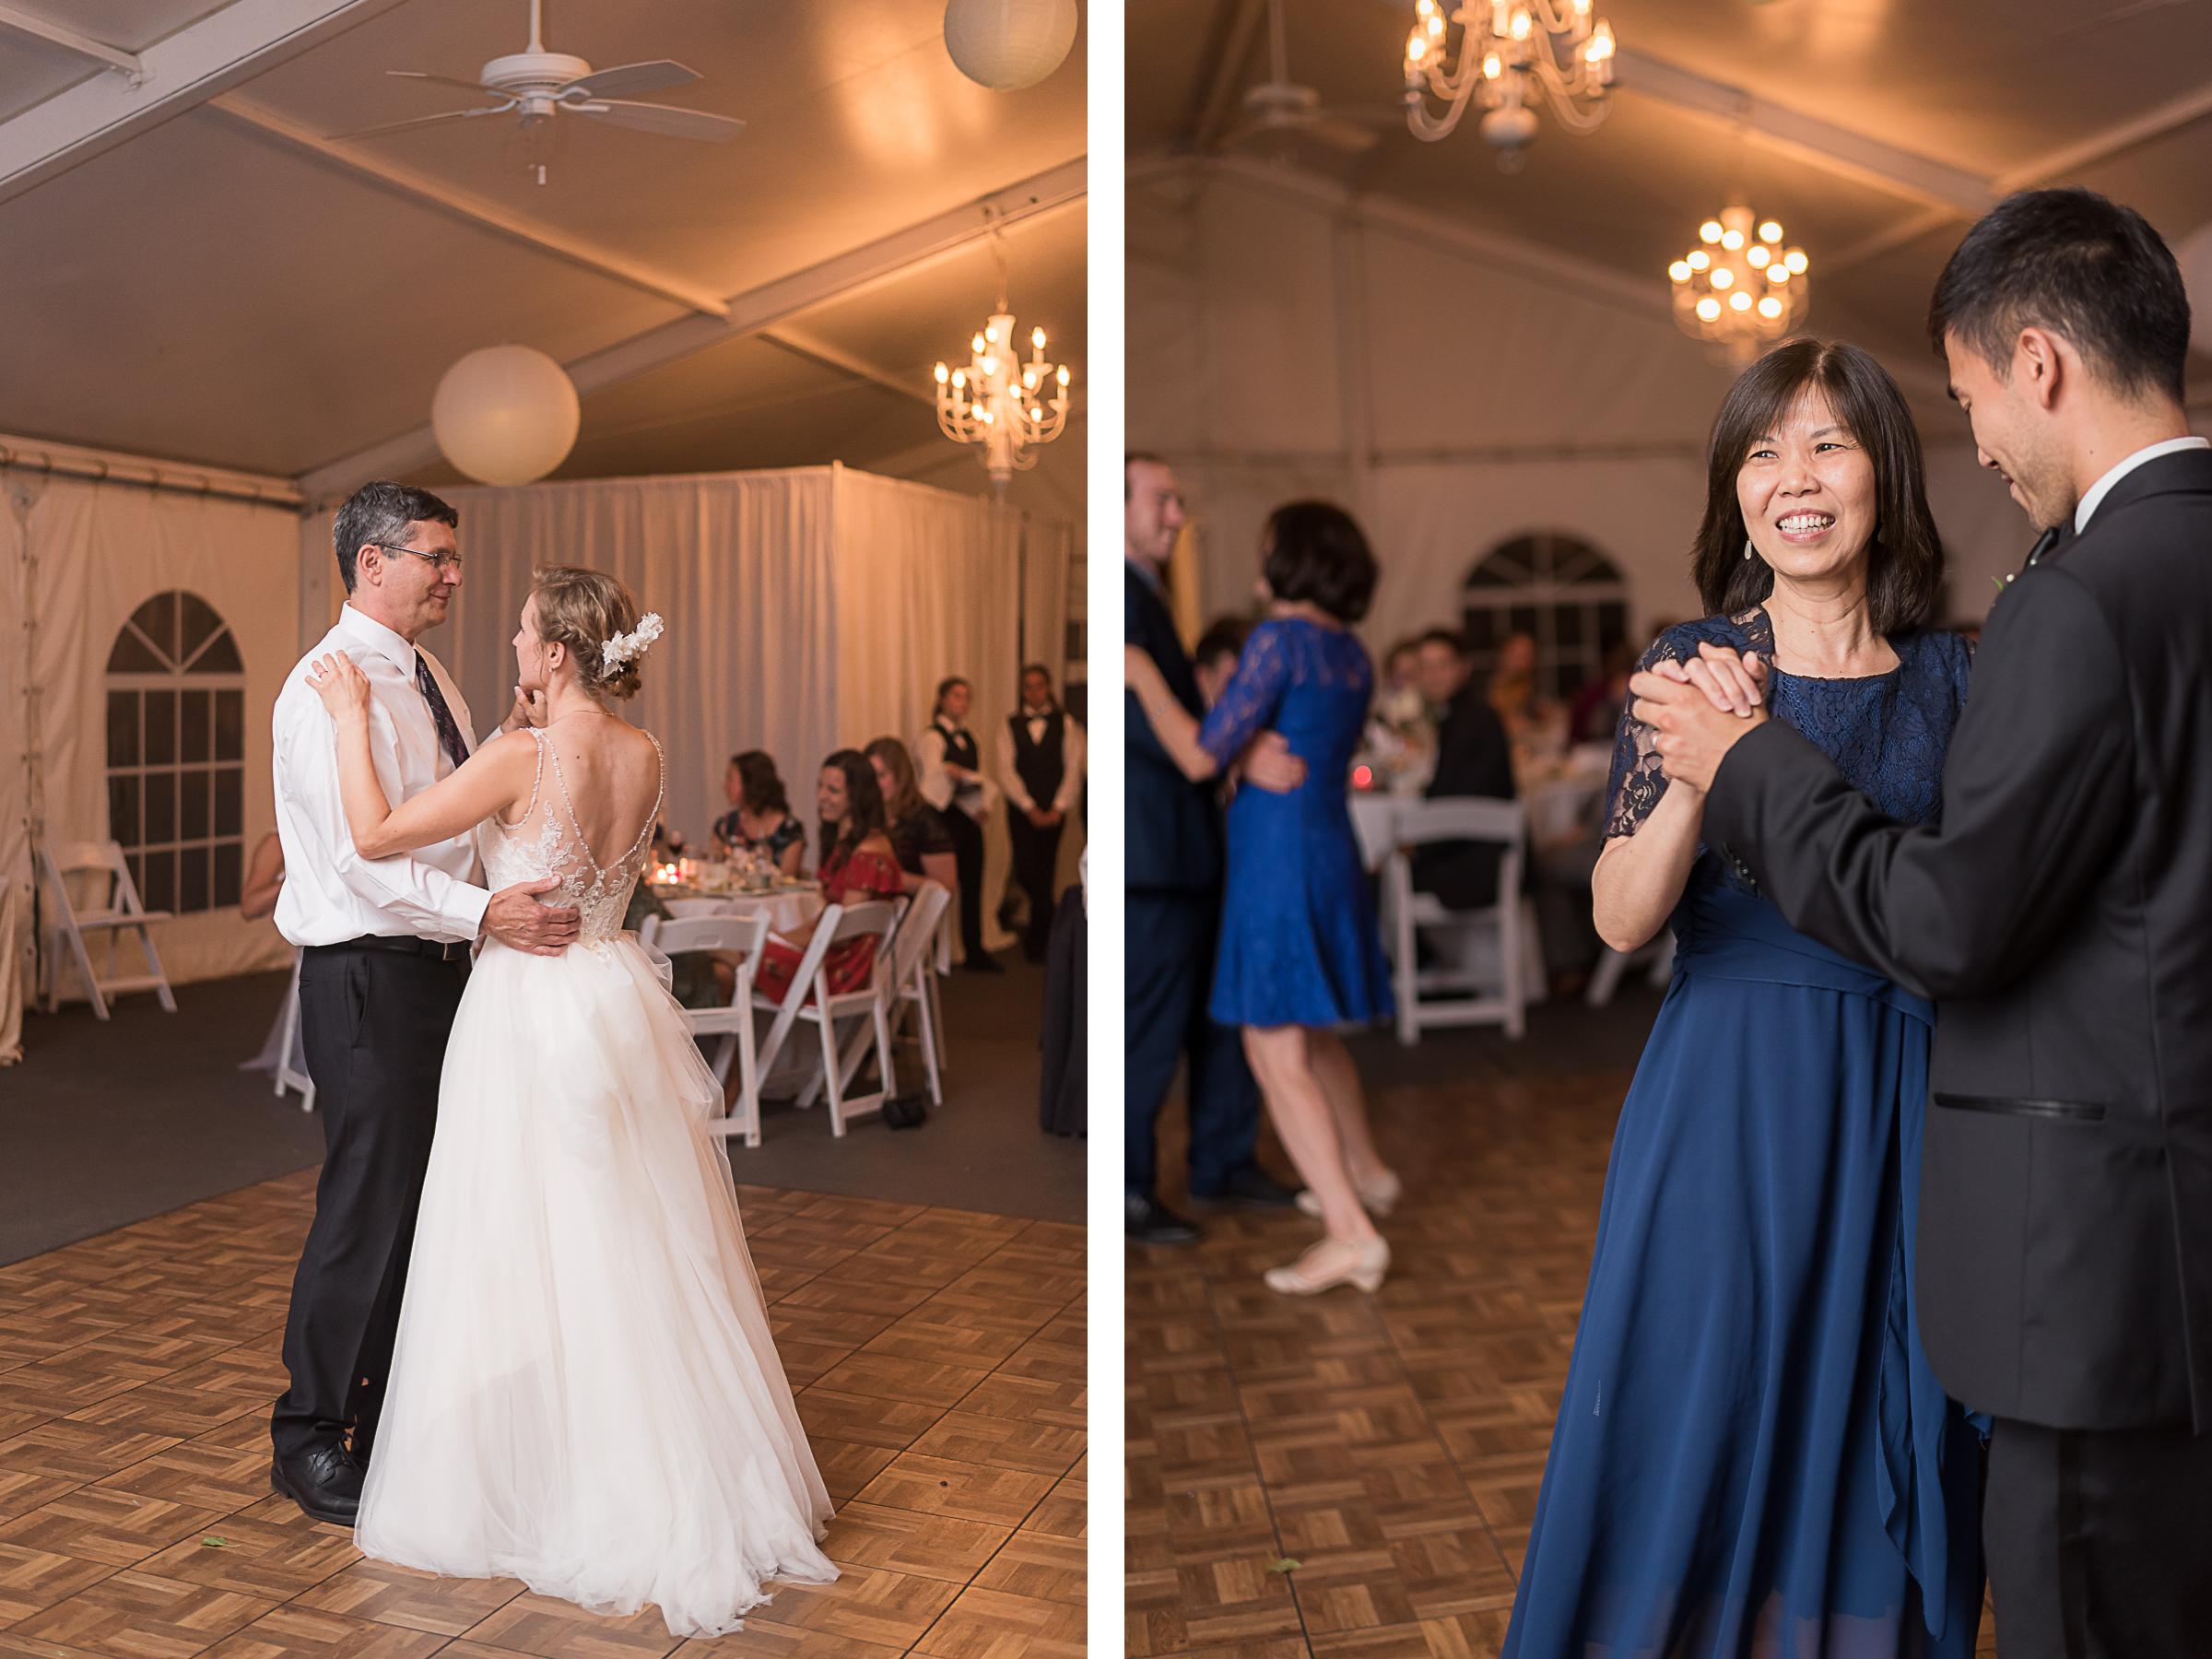 Elkridge-Furnace-Inn-Wedding-Reception-Parents Dance